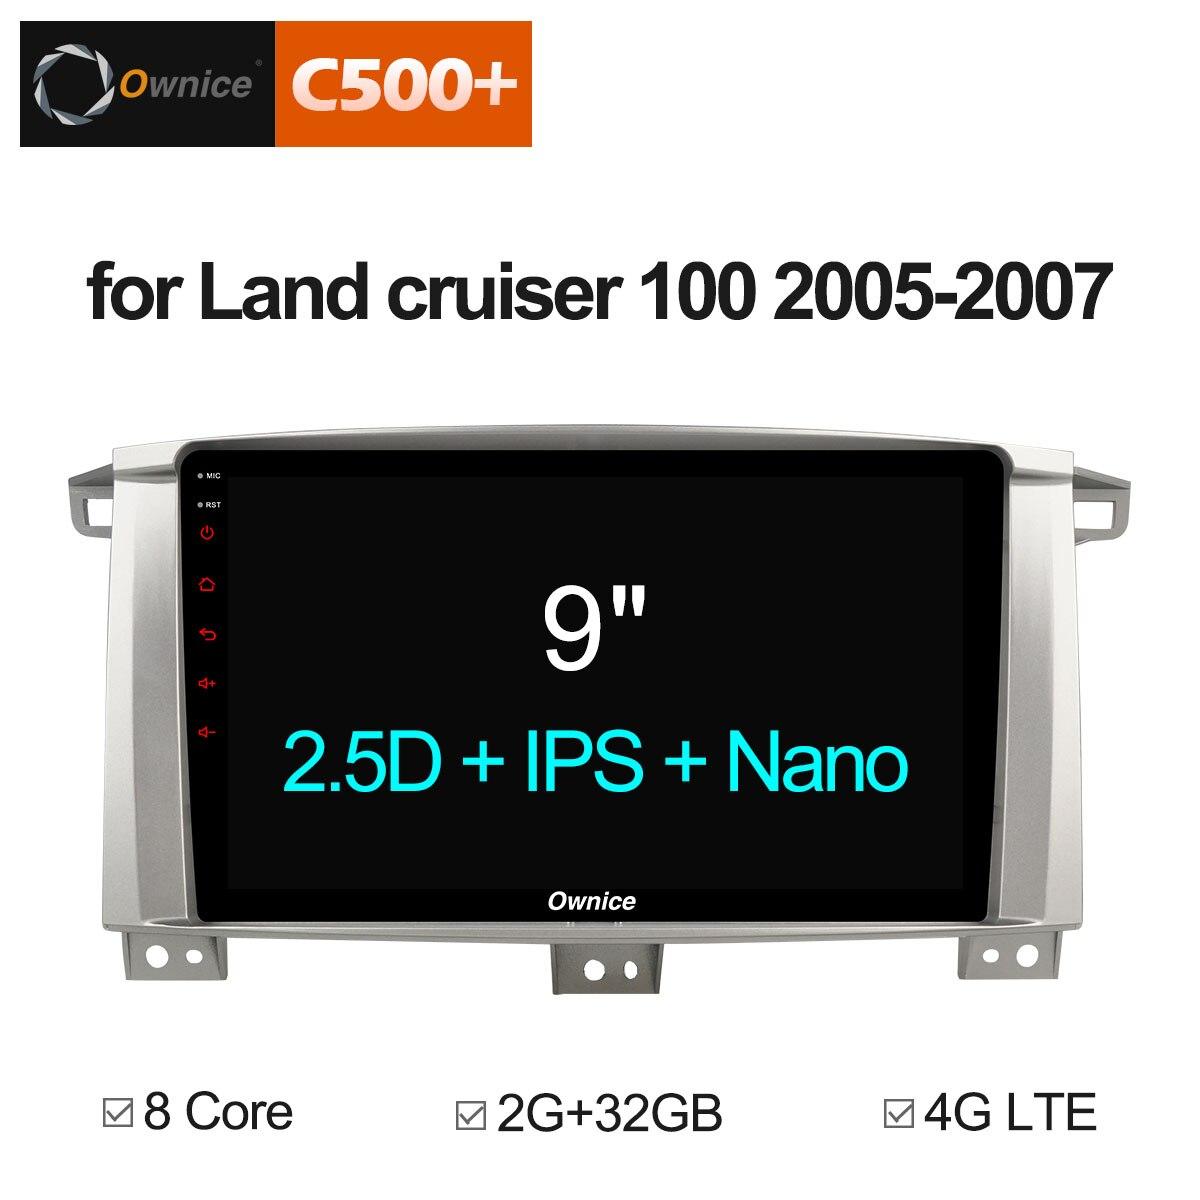 Ownice C500 + G10 Android 8,1 автомобильный DVD стерео для Toyota Land Cruiser 100 LC100/Lexus LX470 2005 2007 Авто Радио RDS Navi 4 г